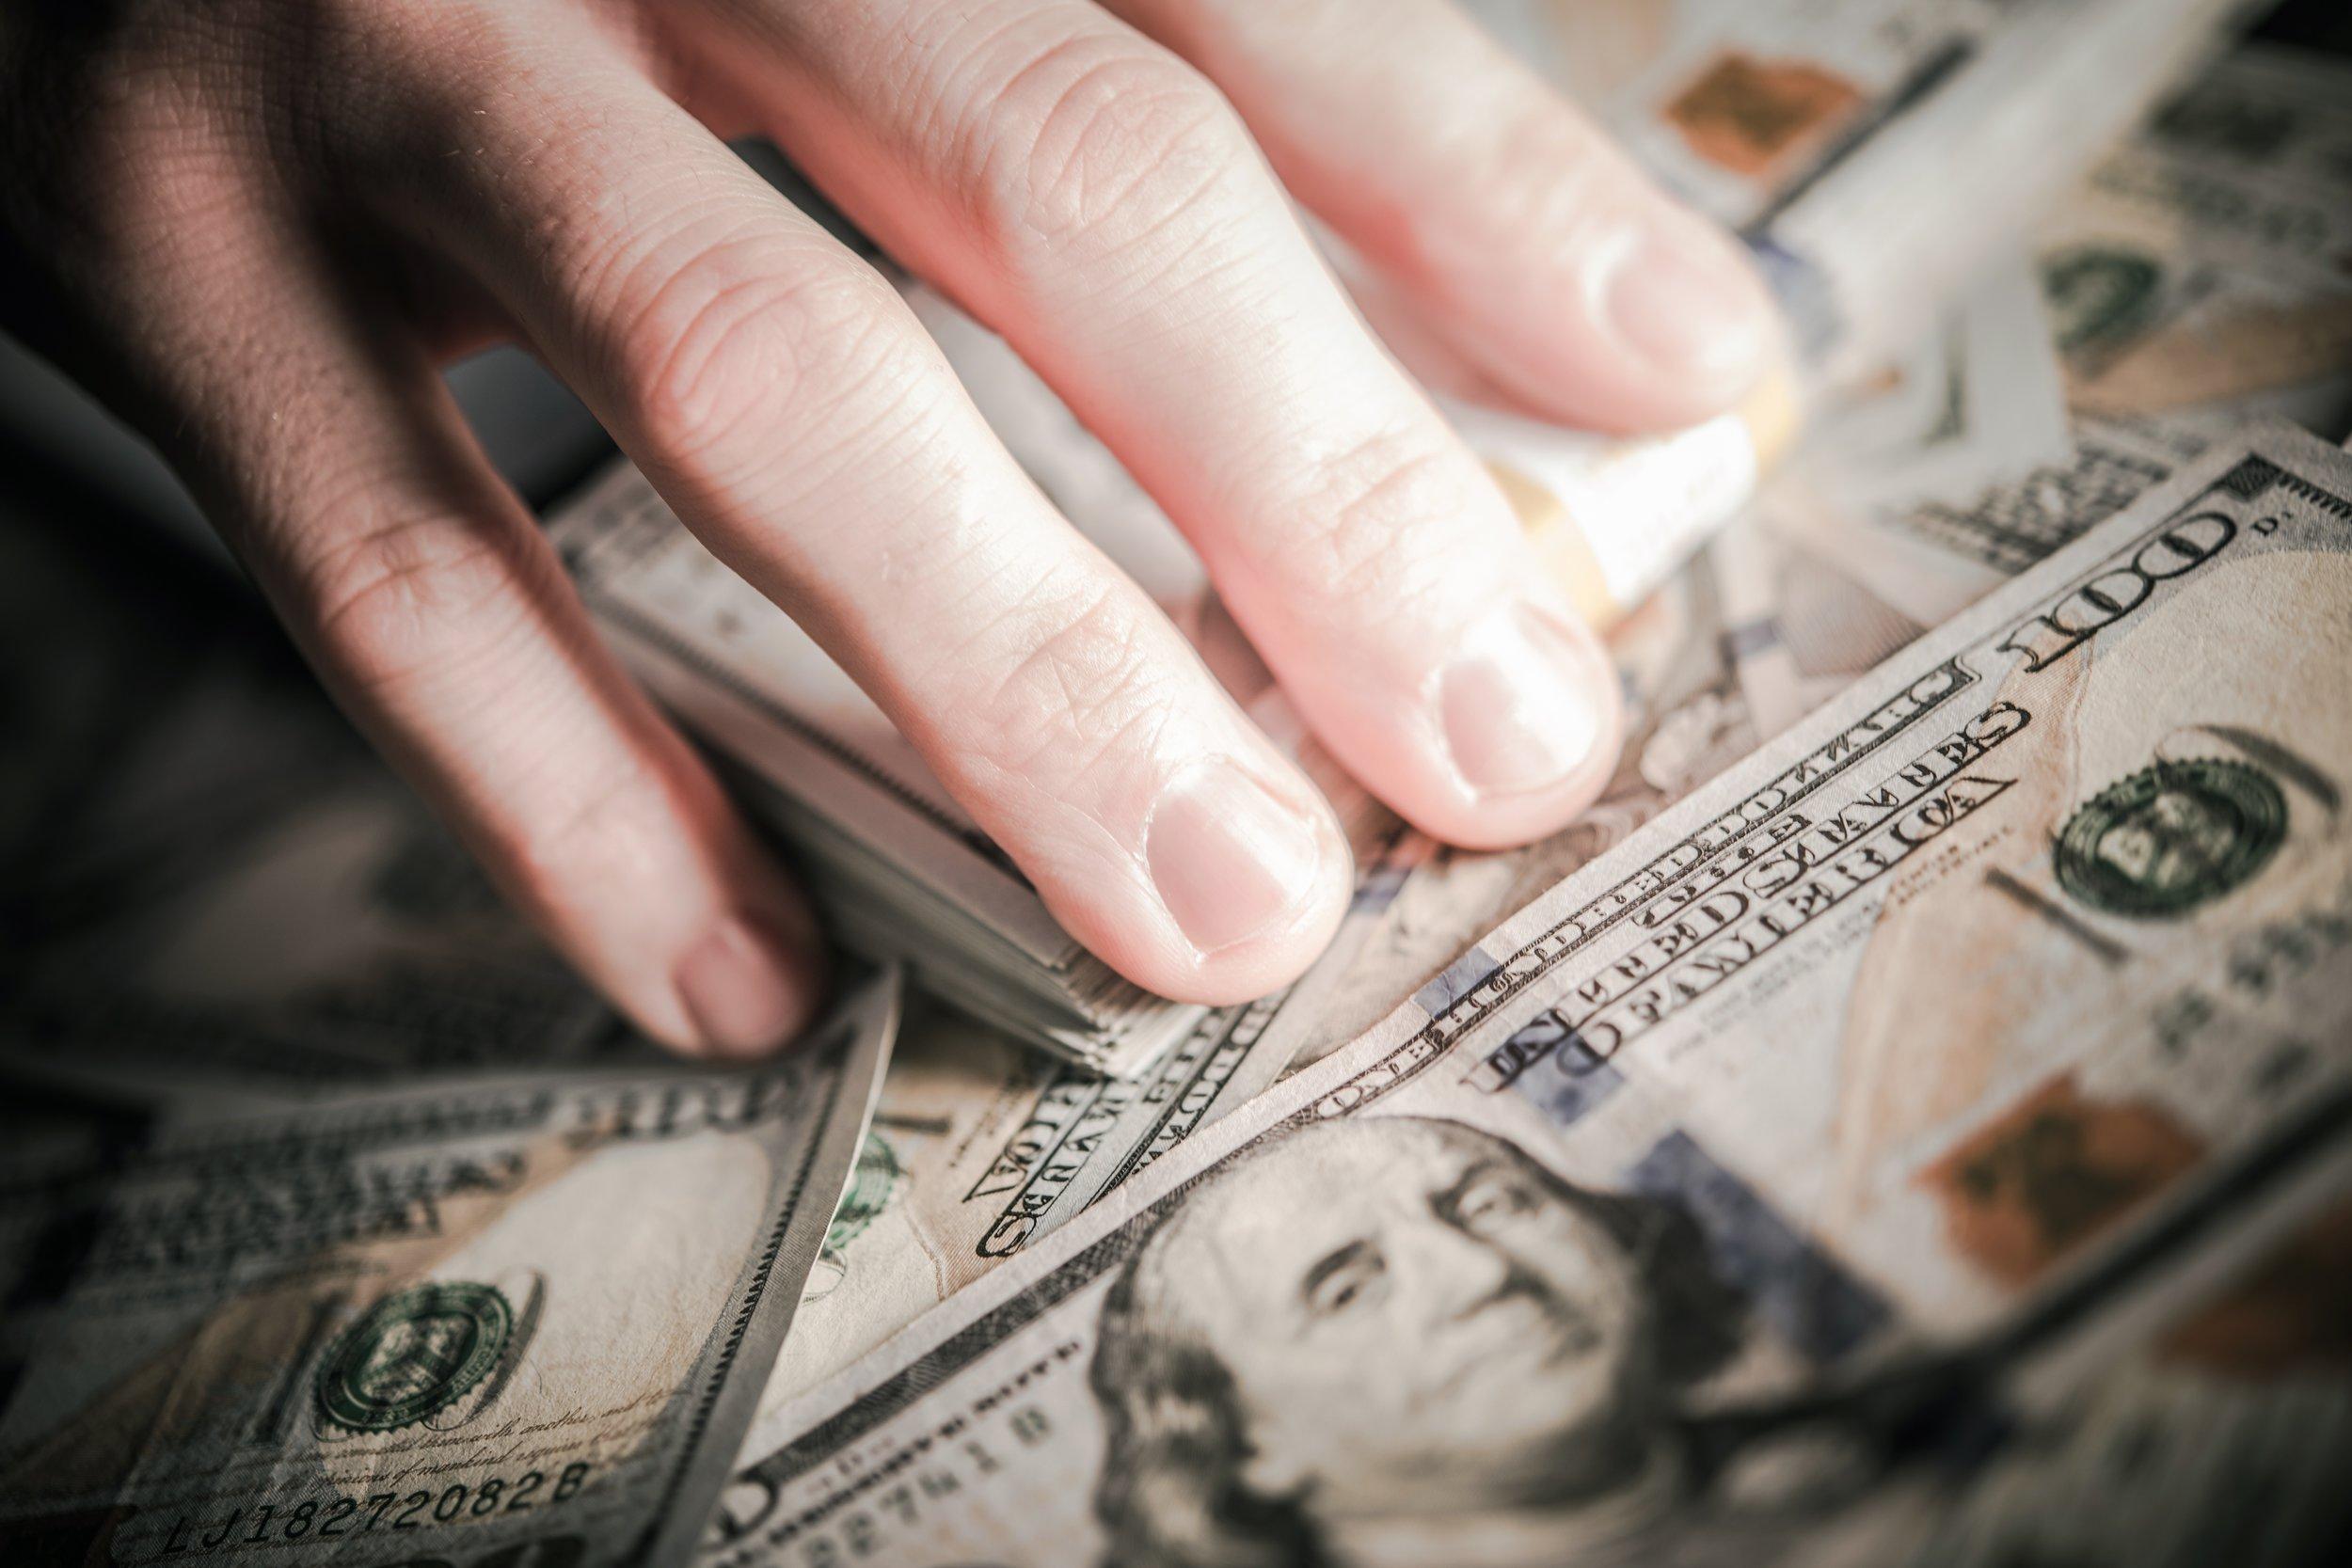 hands-on-the-money-PPZ7NAJ.jpg